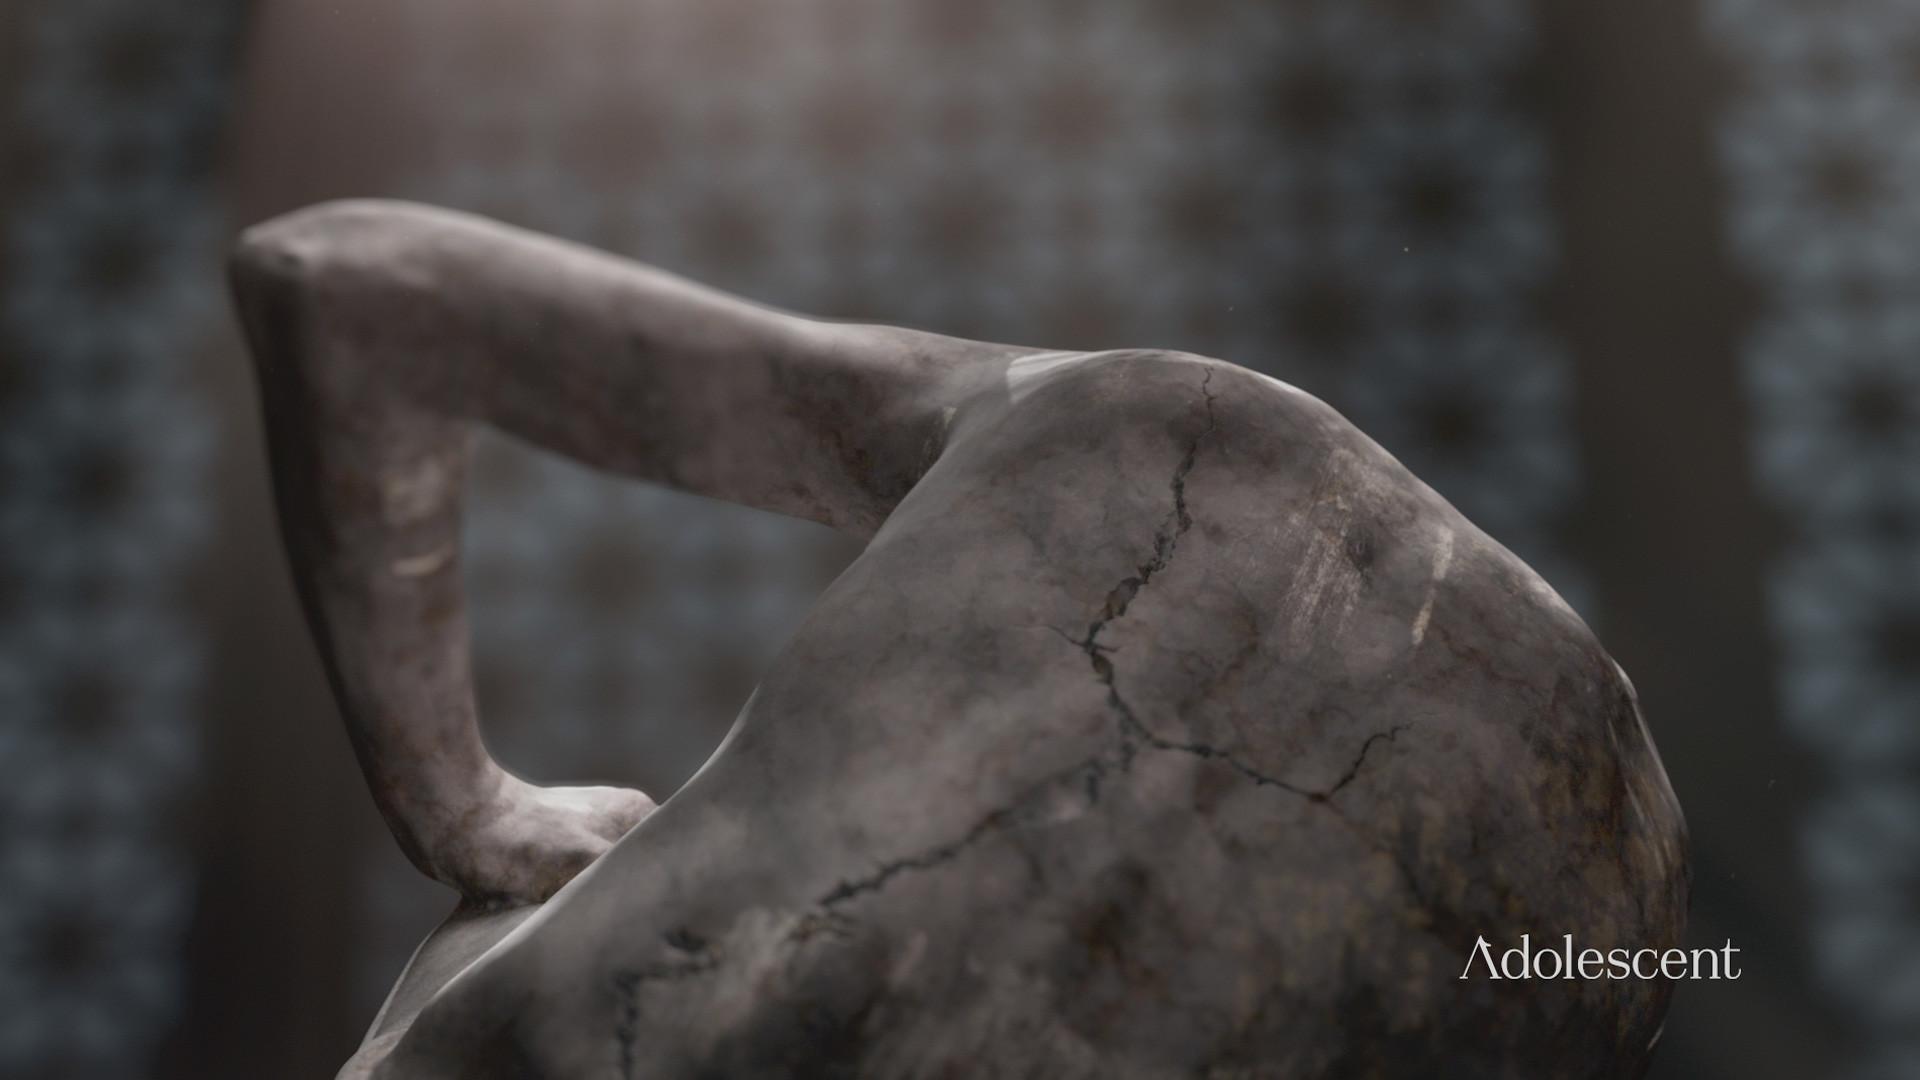 ArtStation - Netflix / Roman Empire: Reign of Blood, Anthony